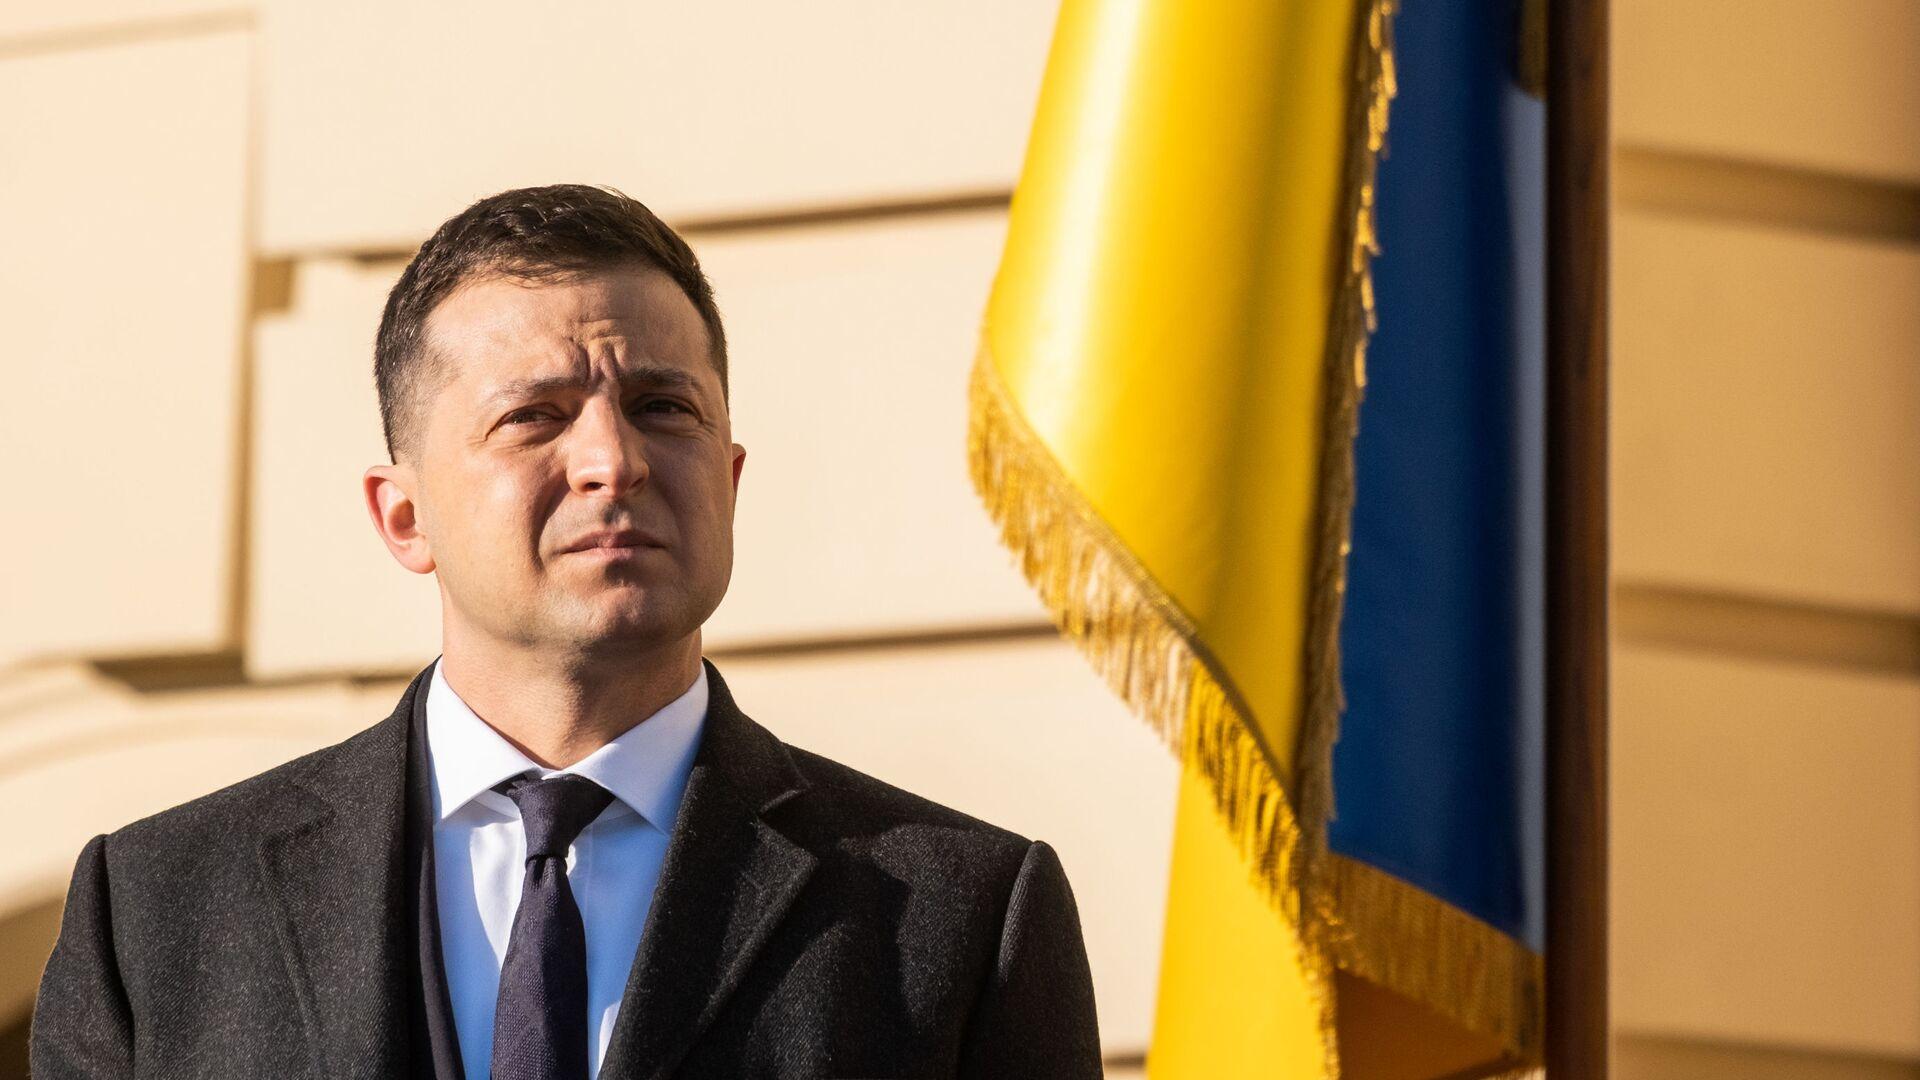 Predsednik Ukrajine Vladimir Zelenski - Sputnik Srbija, 1920, 22.09.2021